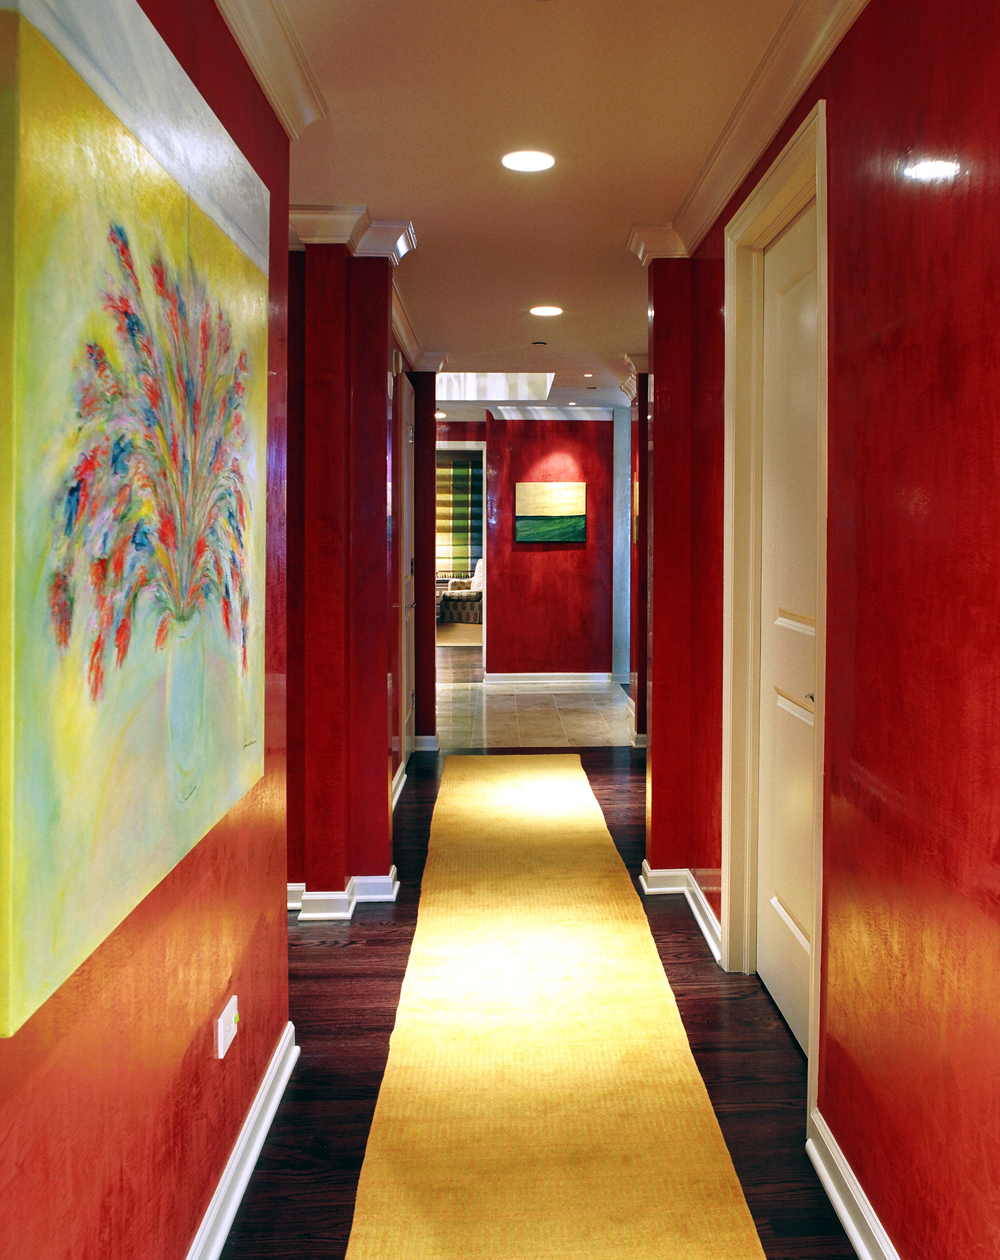 hallway-artwork.jpg